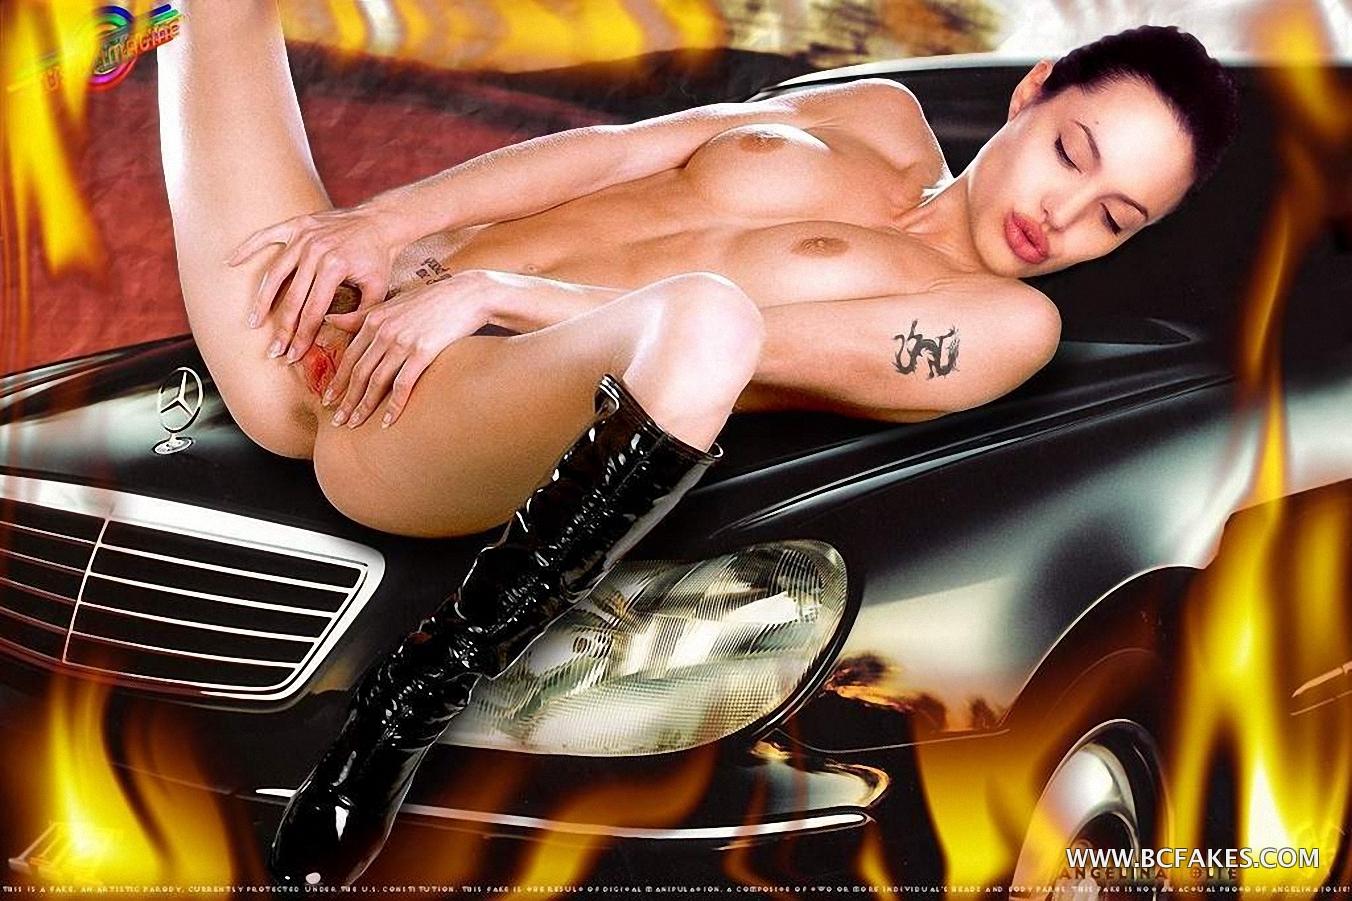 Фото пизды анджелины джоли бесплатно, Голая Angelina Jolie фото Обнаженная Анджелина Джоли 7 фотография